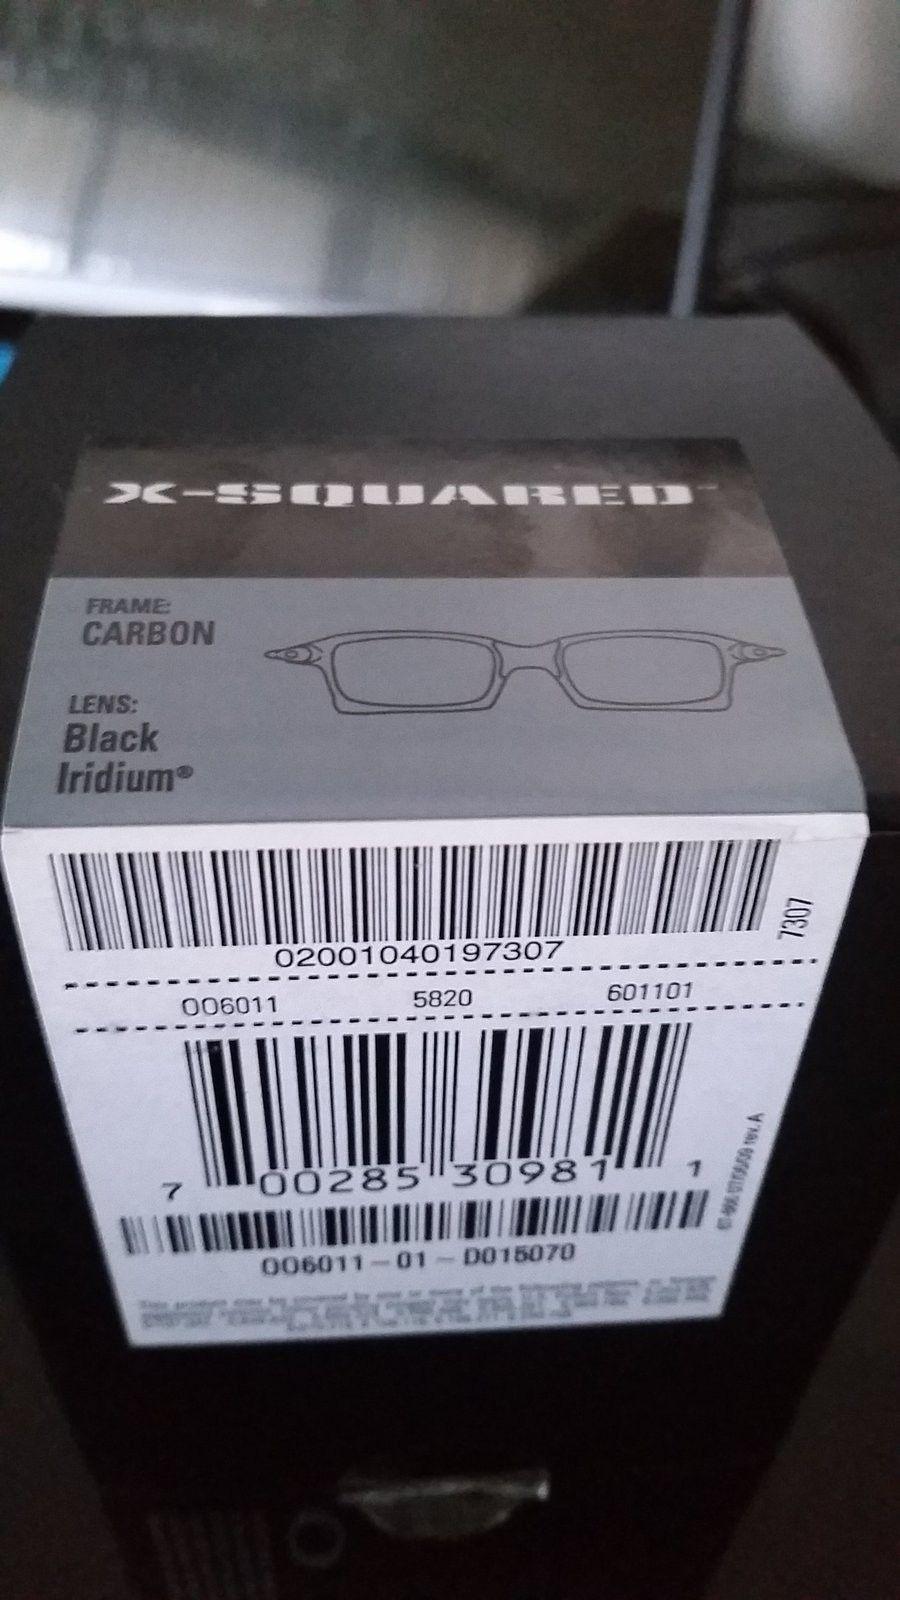 BNIB XS carbon with BI lenses - SKU 6011-01 - 20151012_175524.jpg